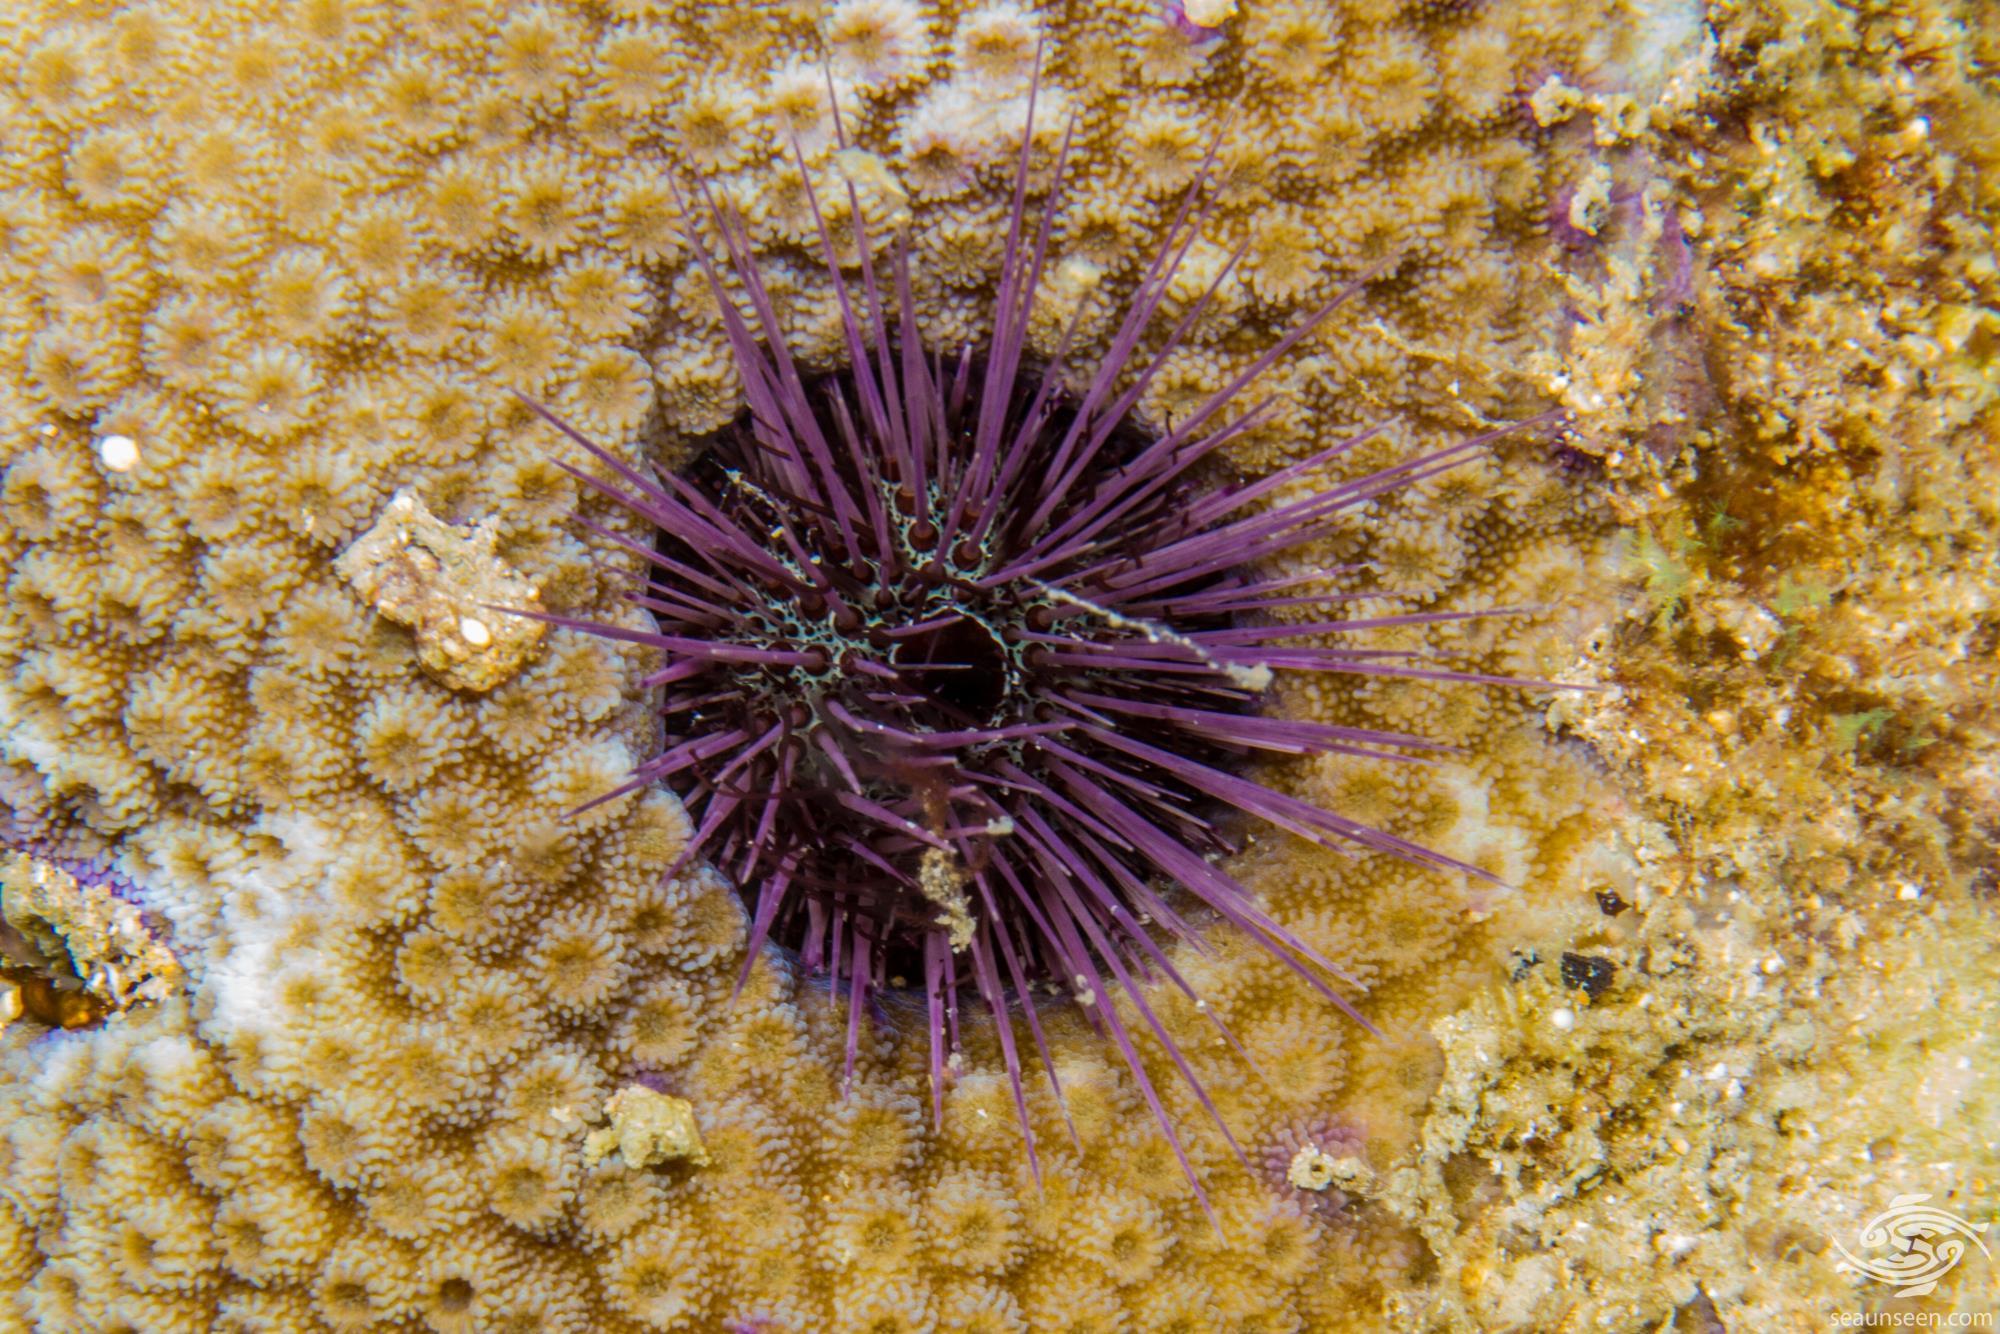 Burrowing Fine Spine Urchin (Echinostrephus molaris)